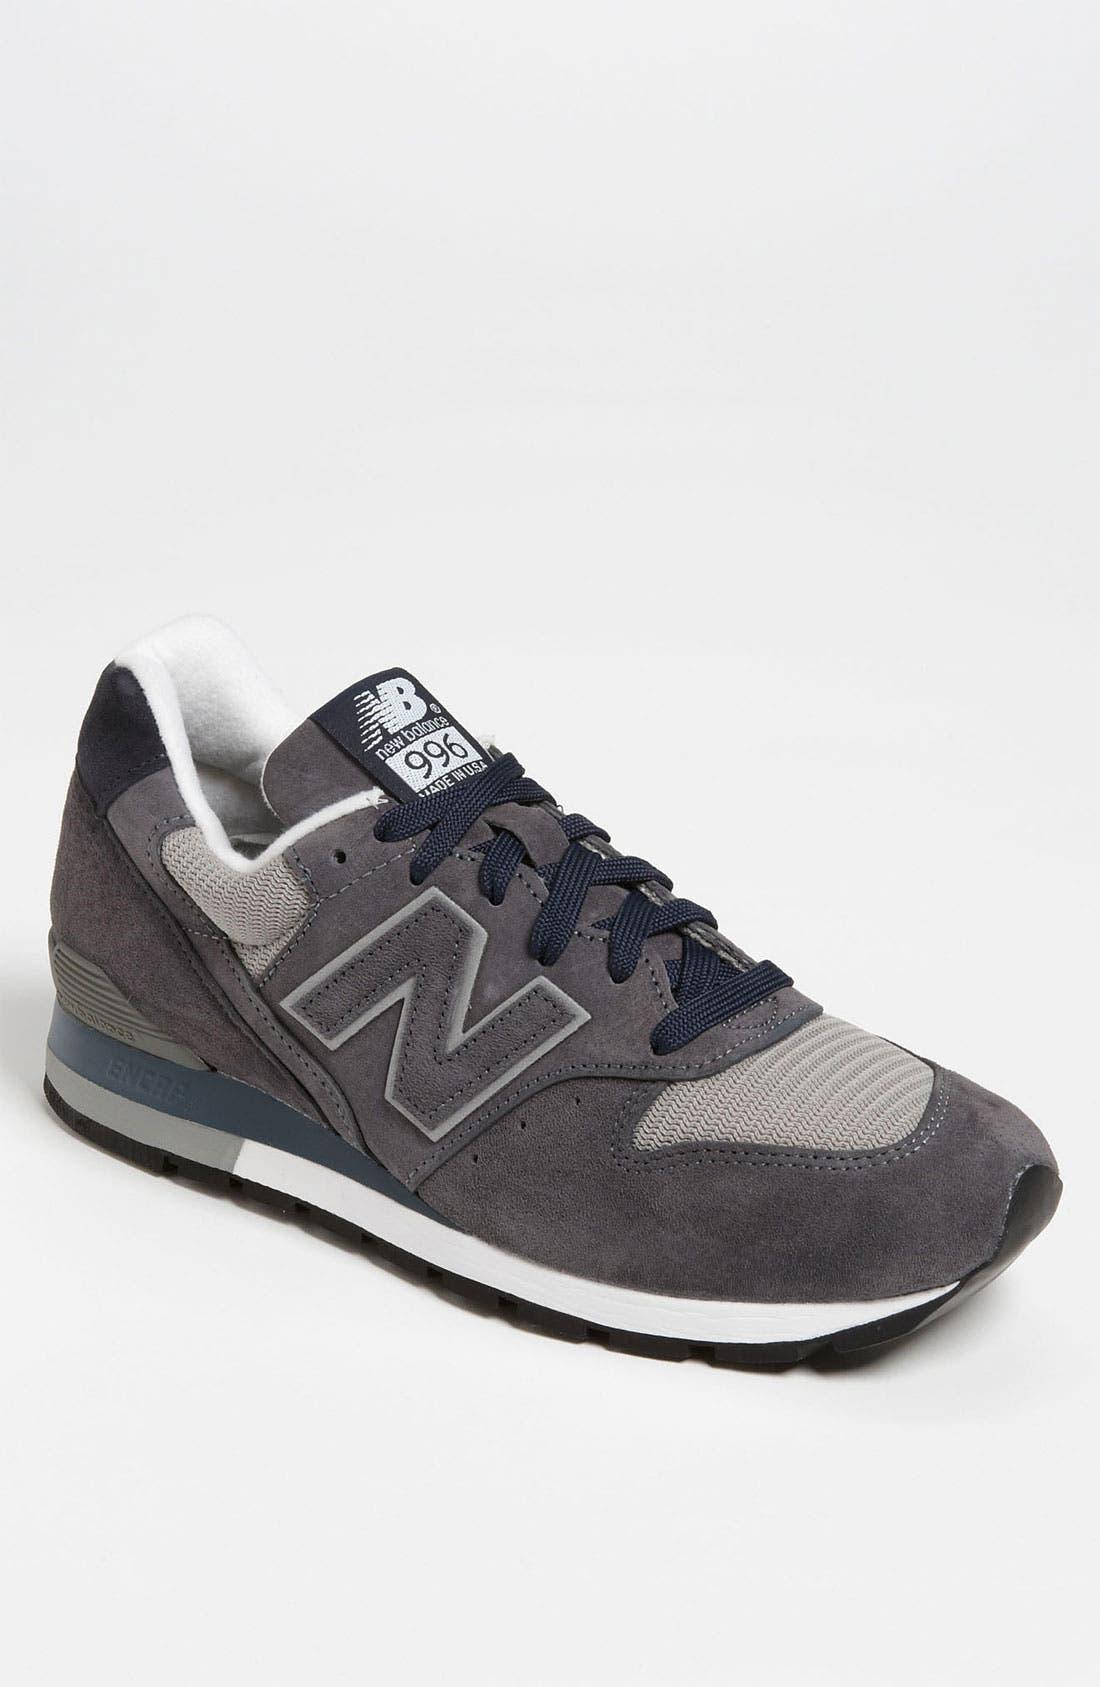 NEW BALANCE, '996' Sneaker, Main thumbnail 1, color, 030